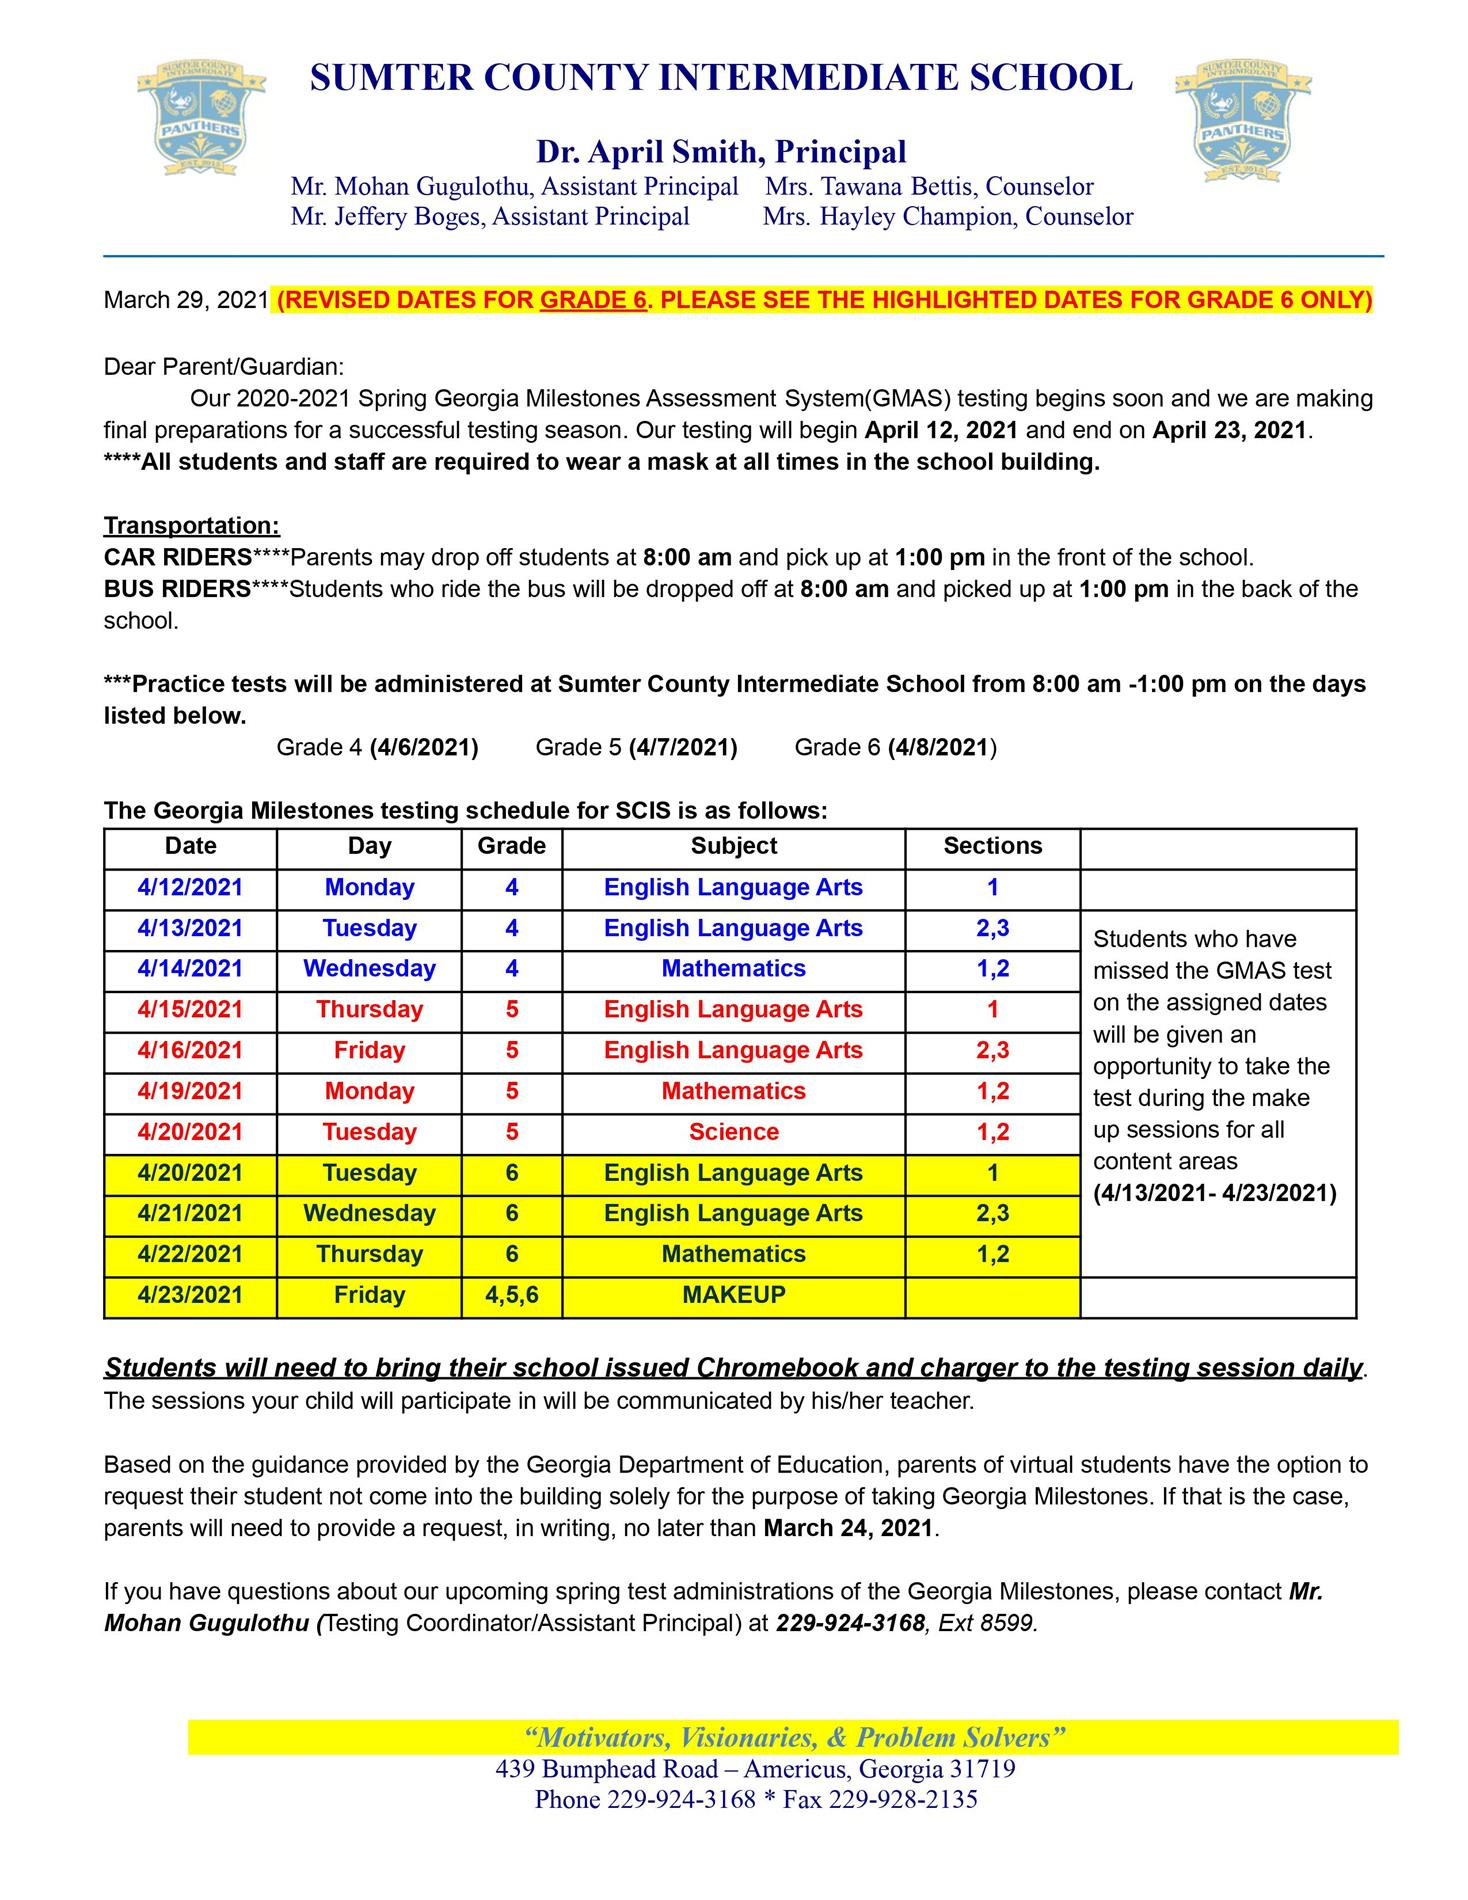 6th Grade Georgia Milestone Testing Updates